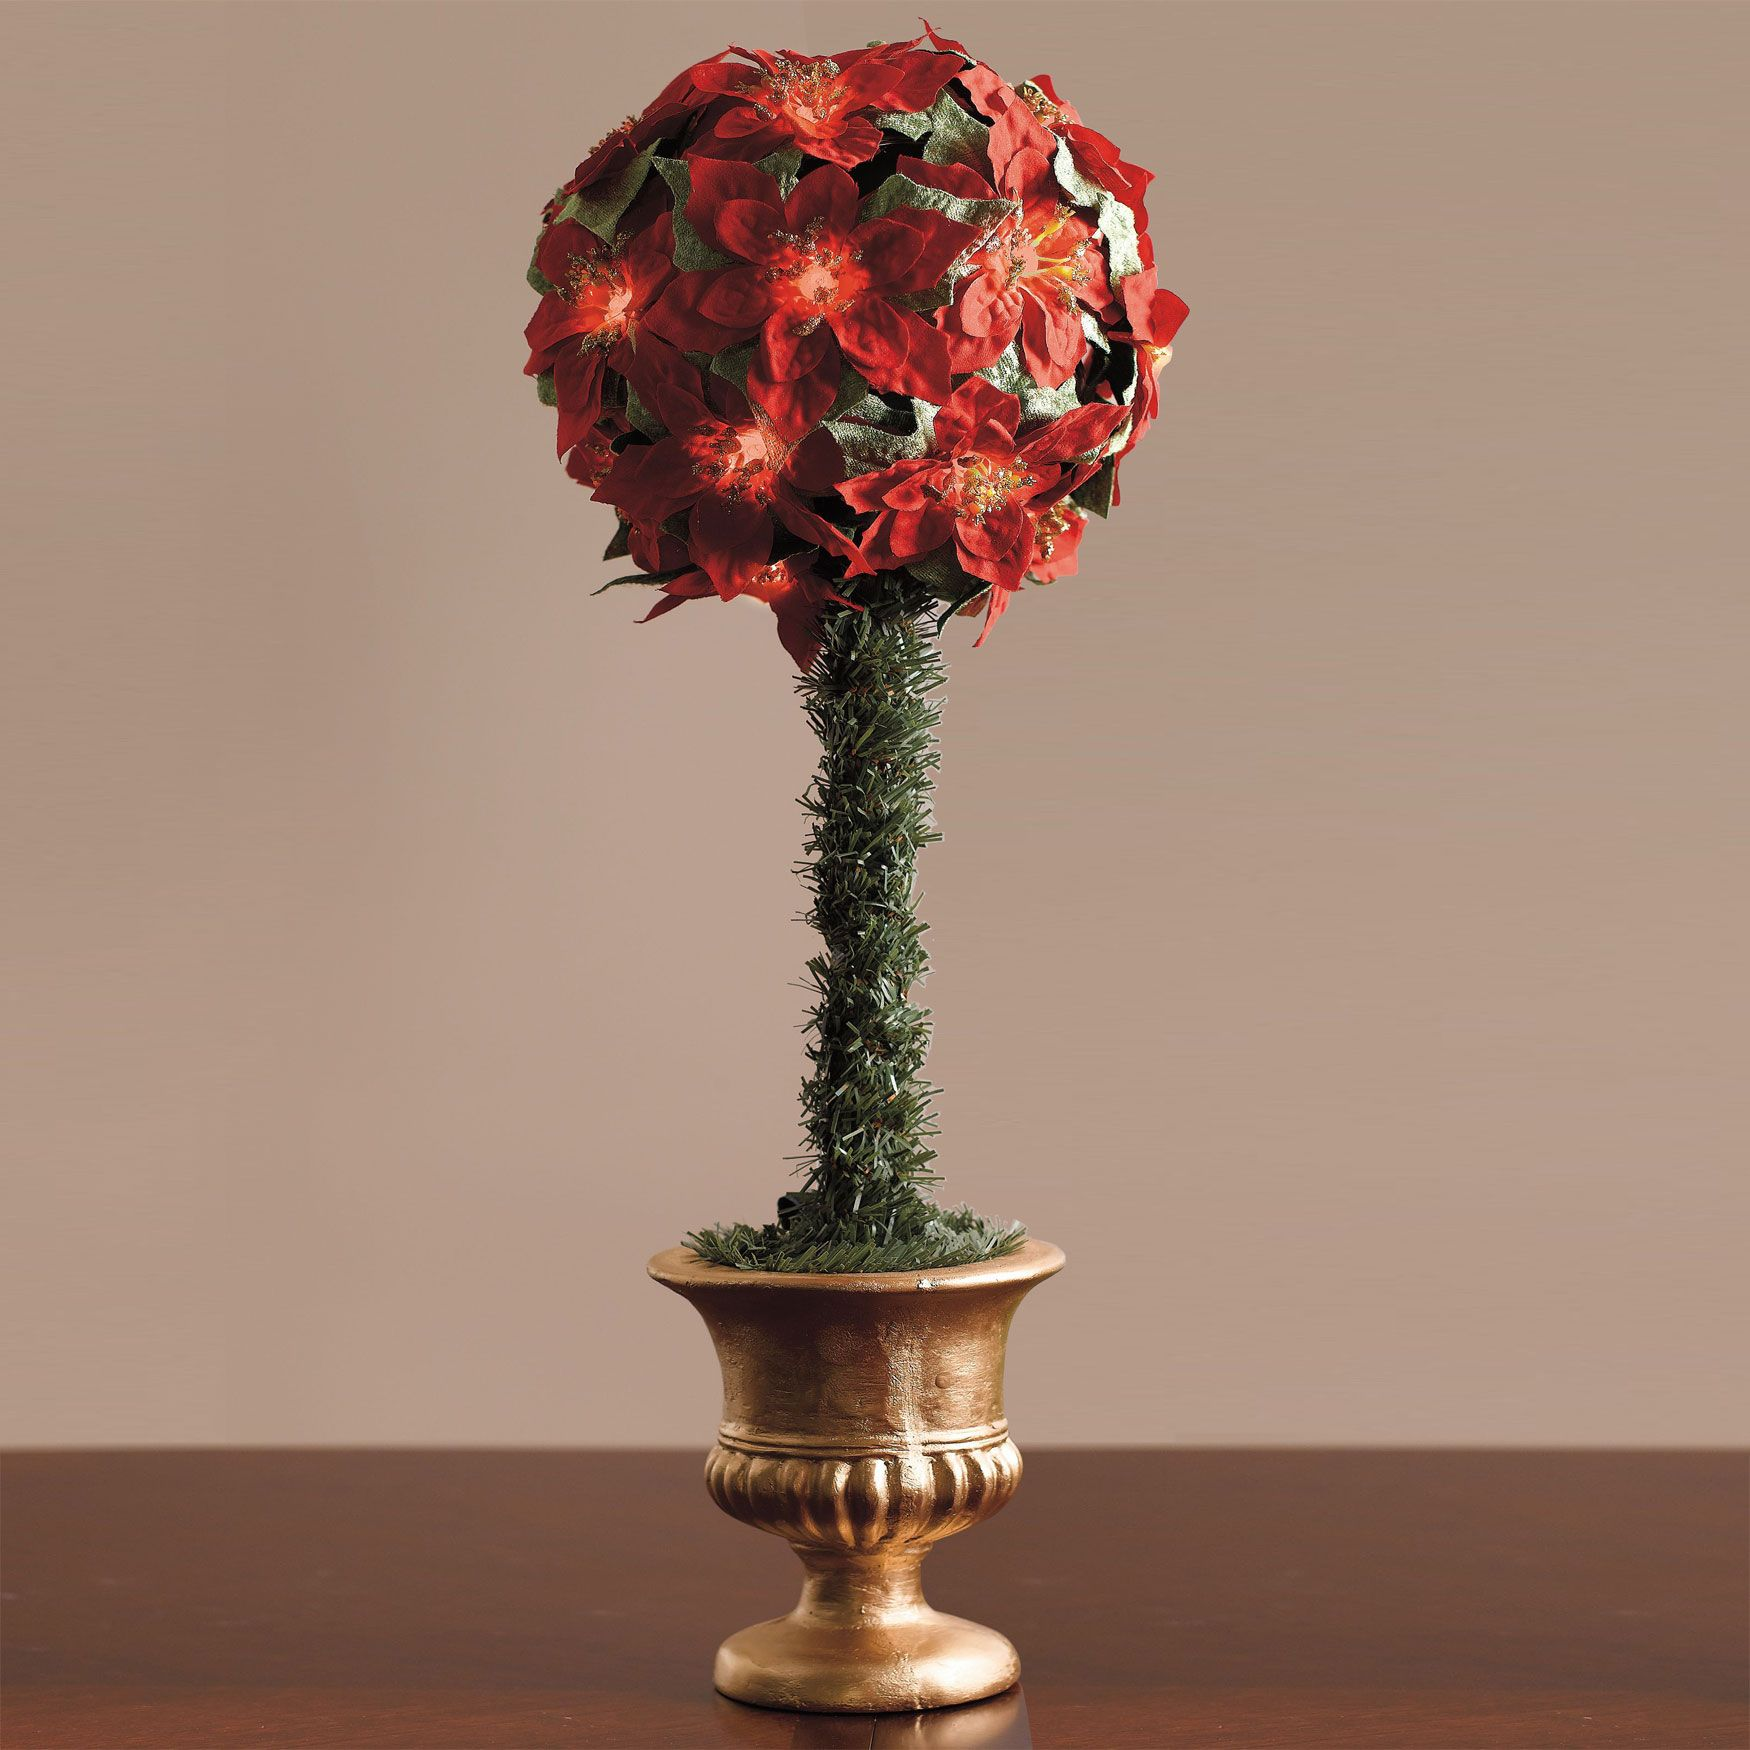 Cordless LED Poinsettia Ball Topiary | Christmas Decor ...